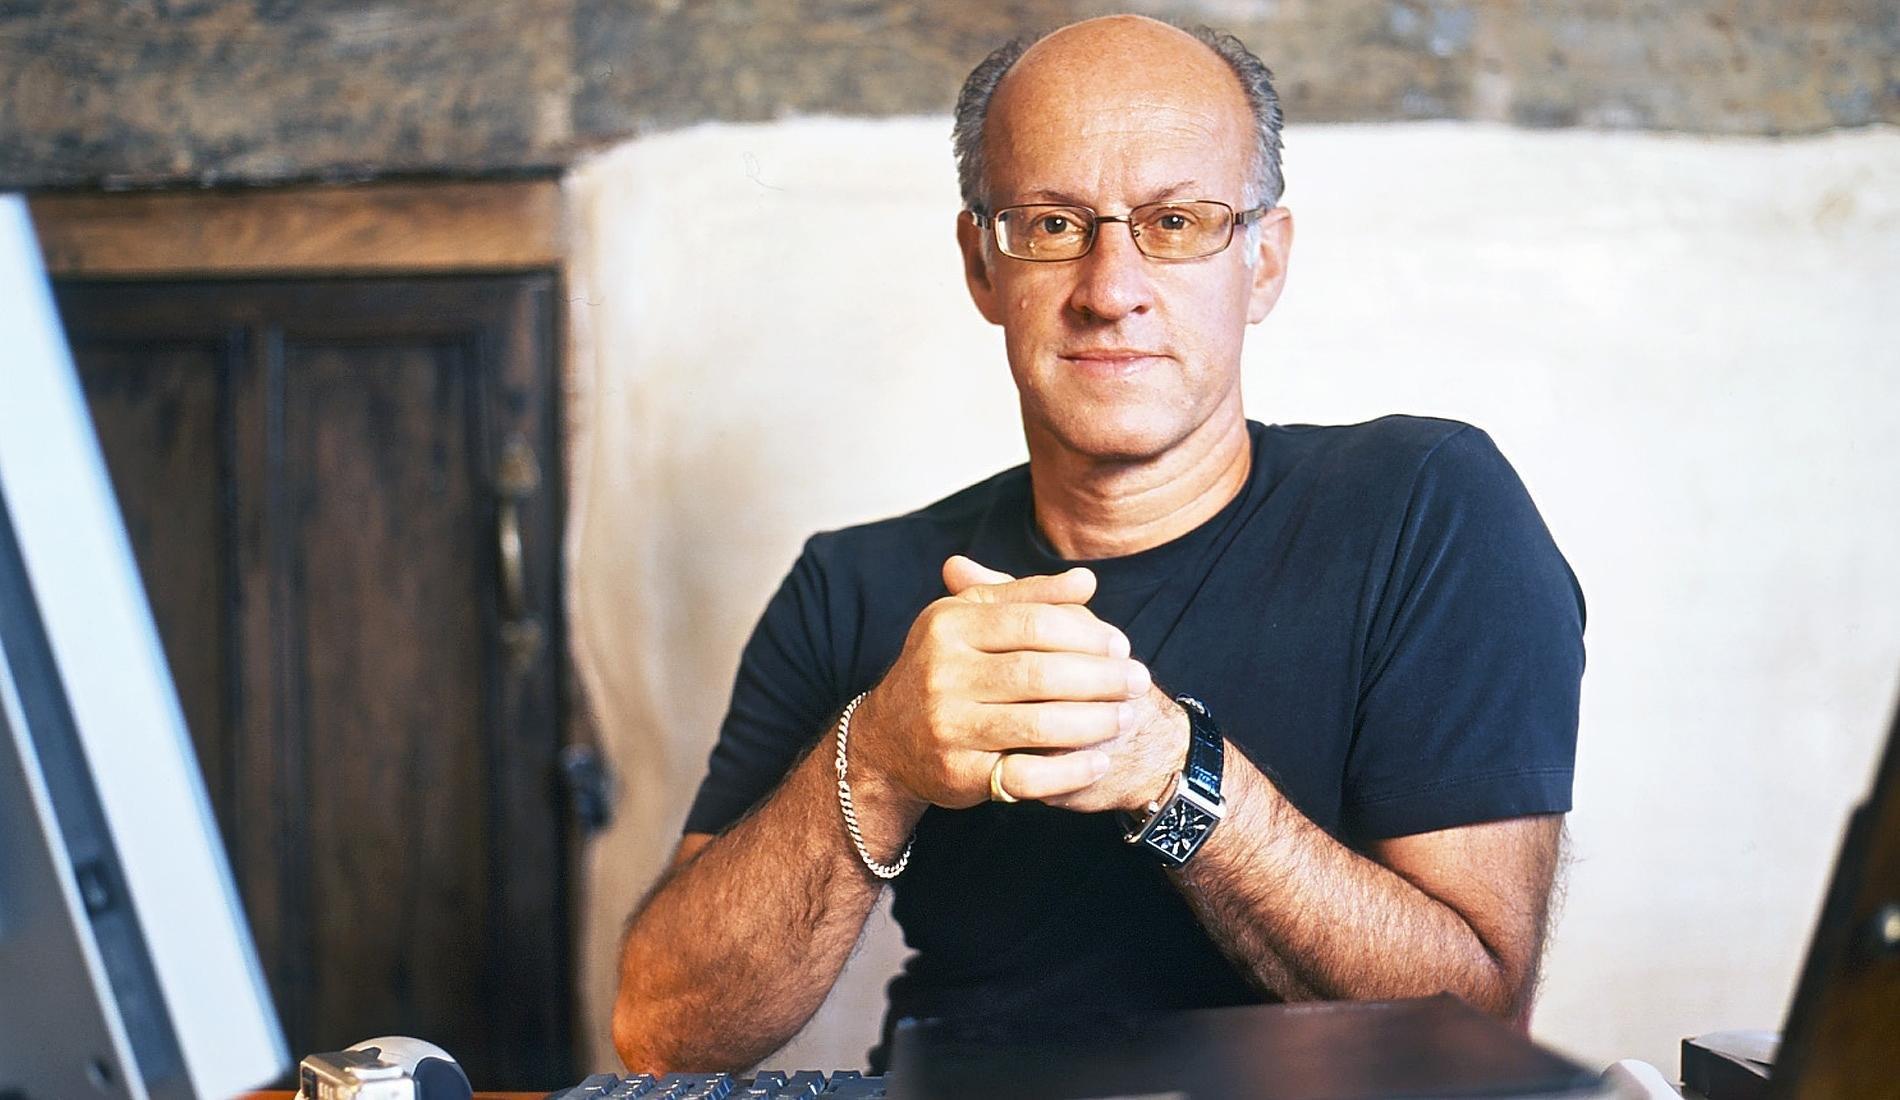 Roger Saul